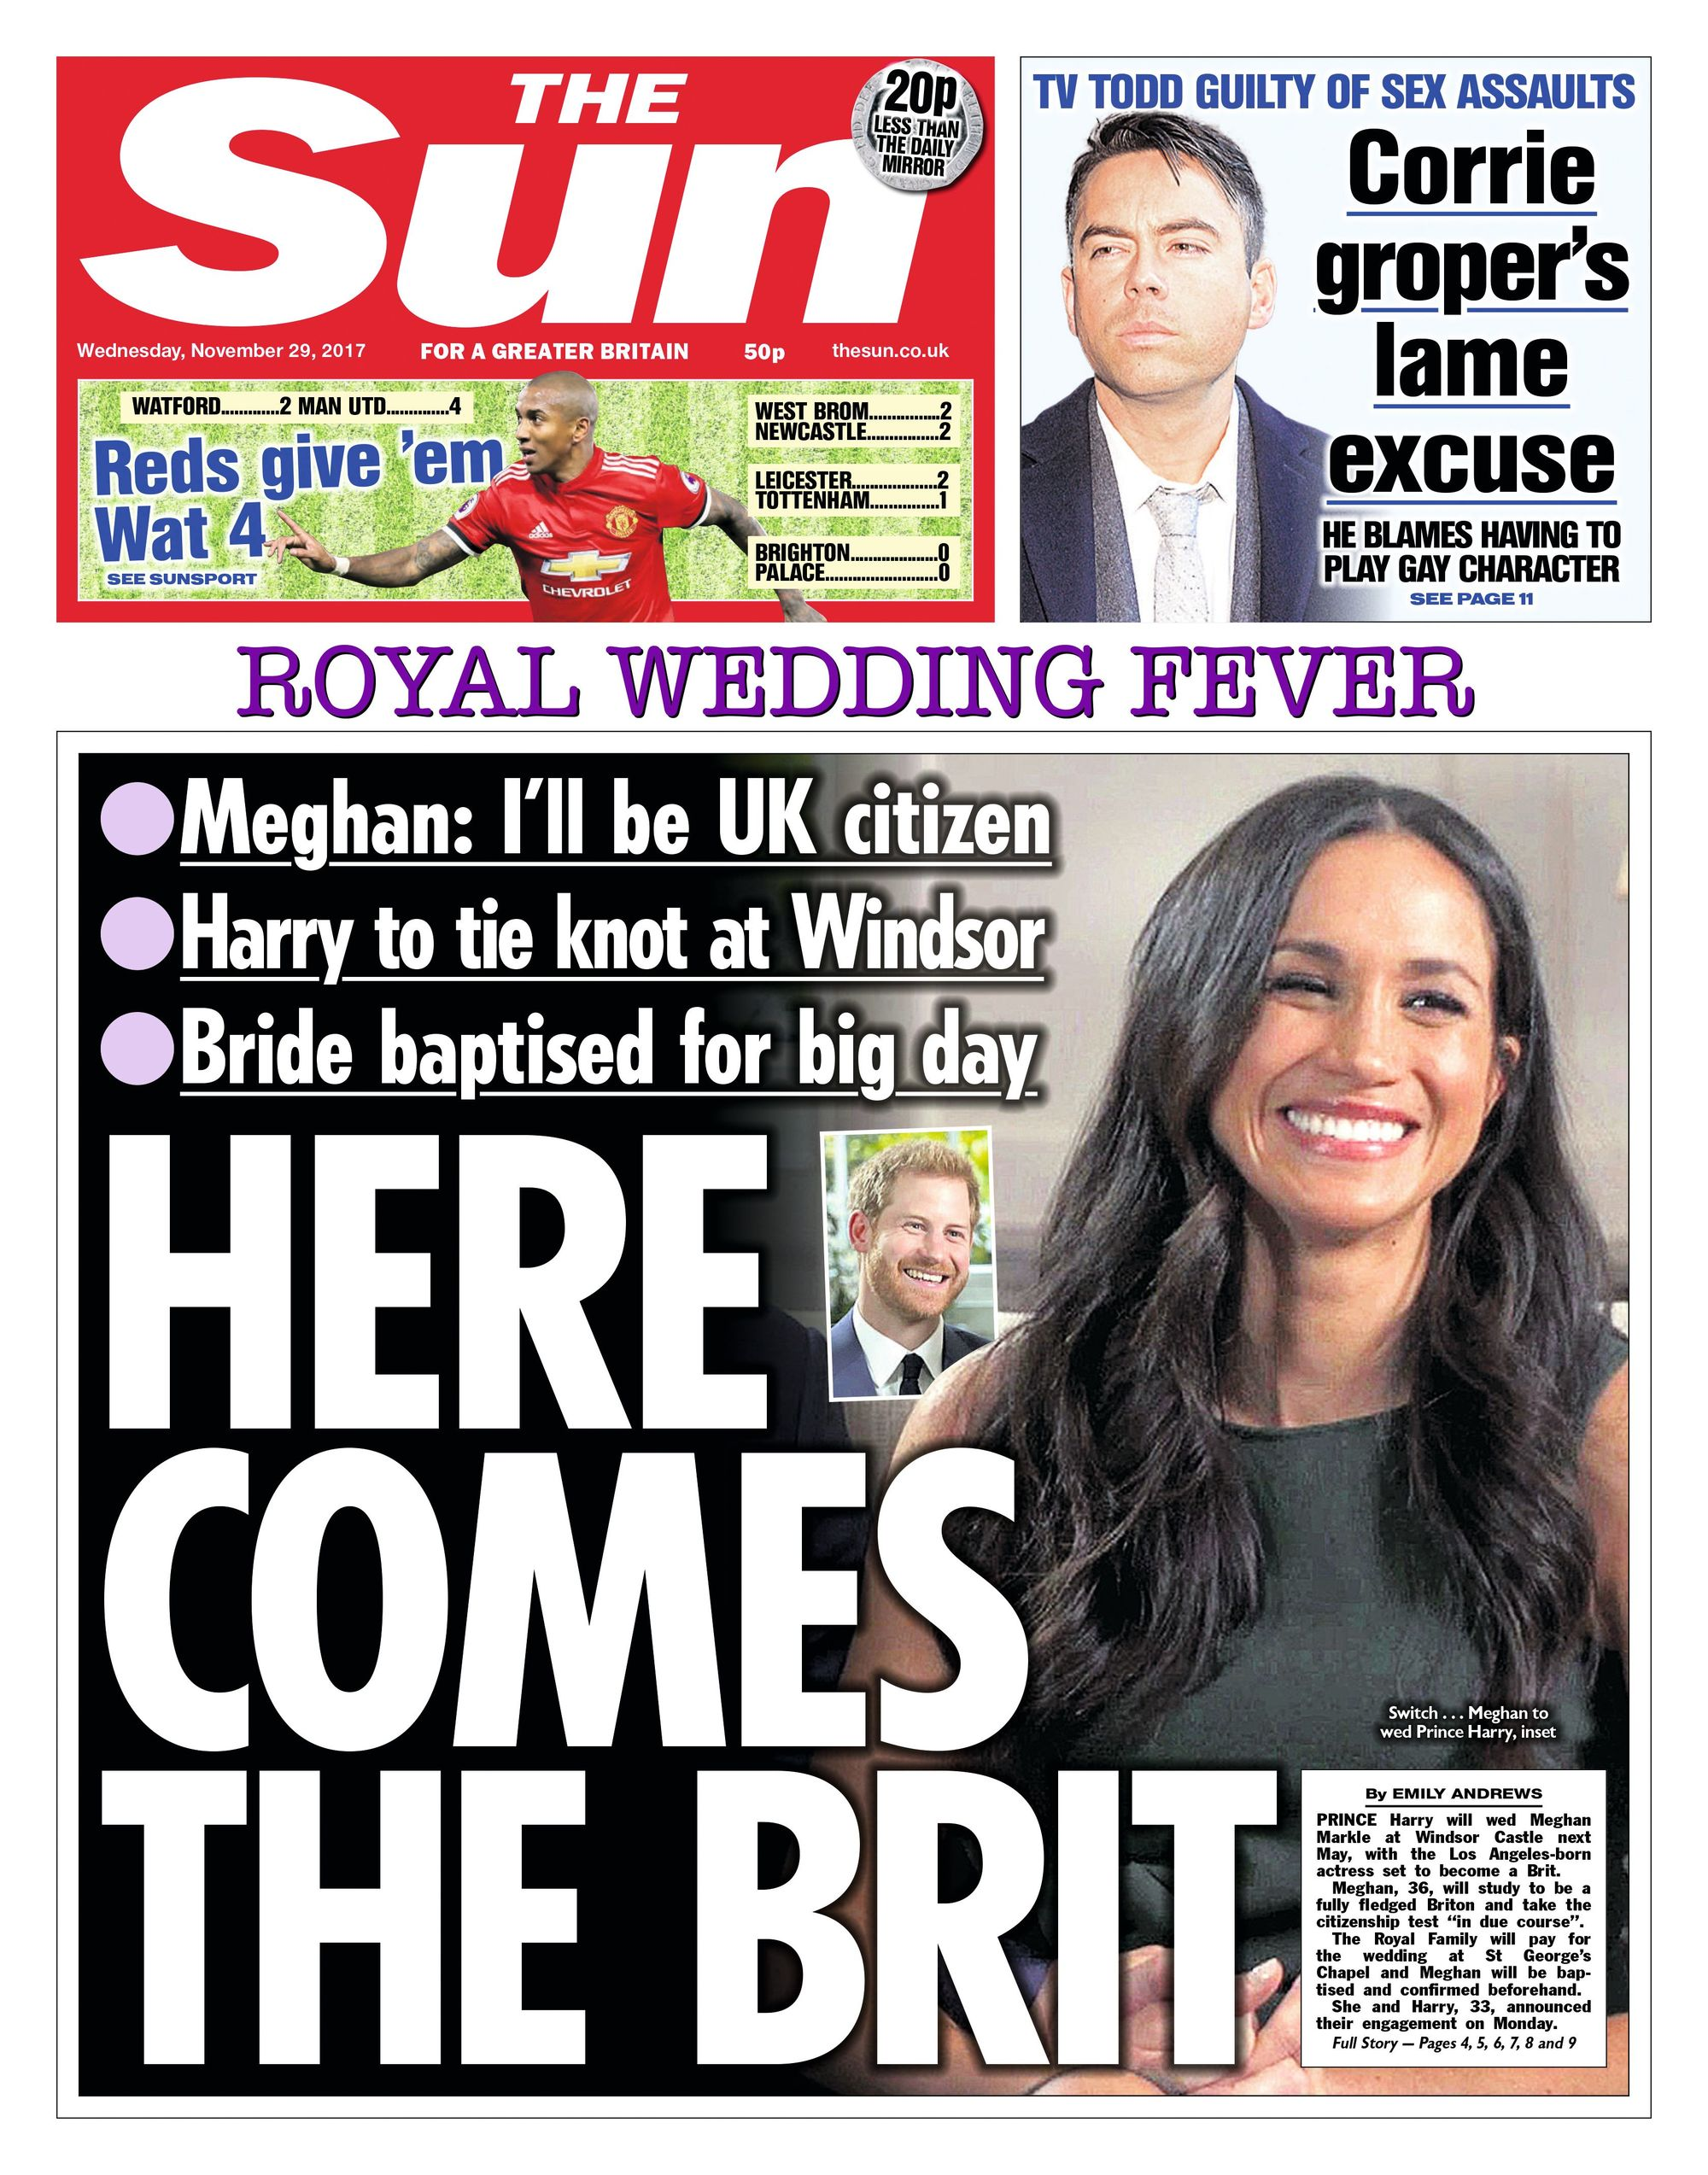 The Sun, November 2017.